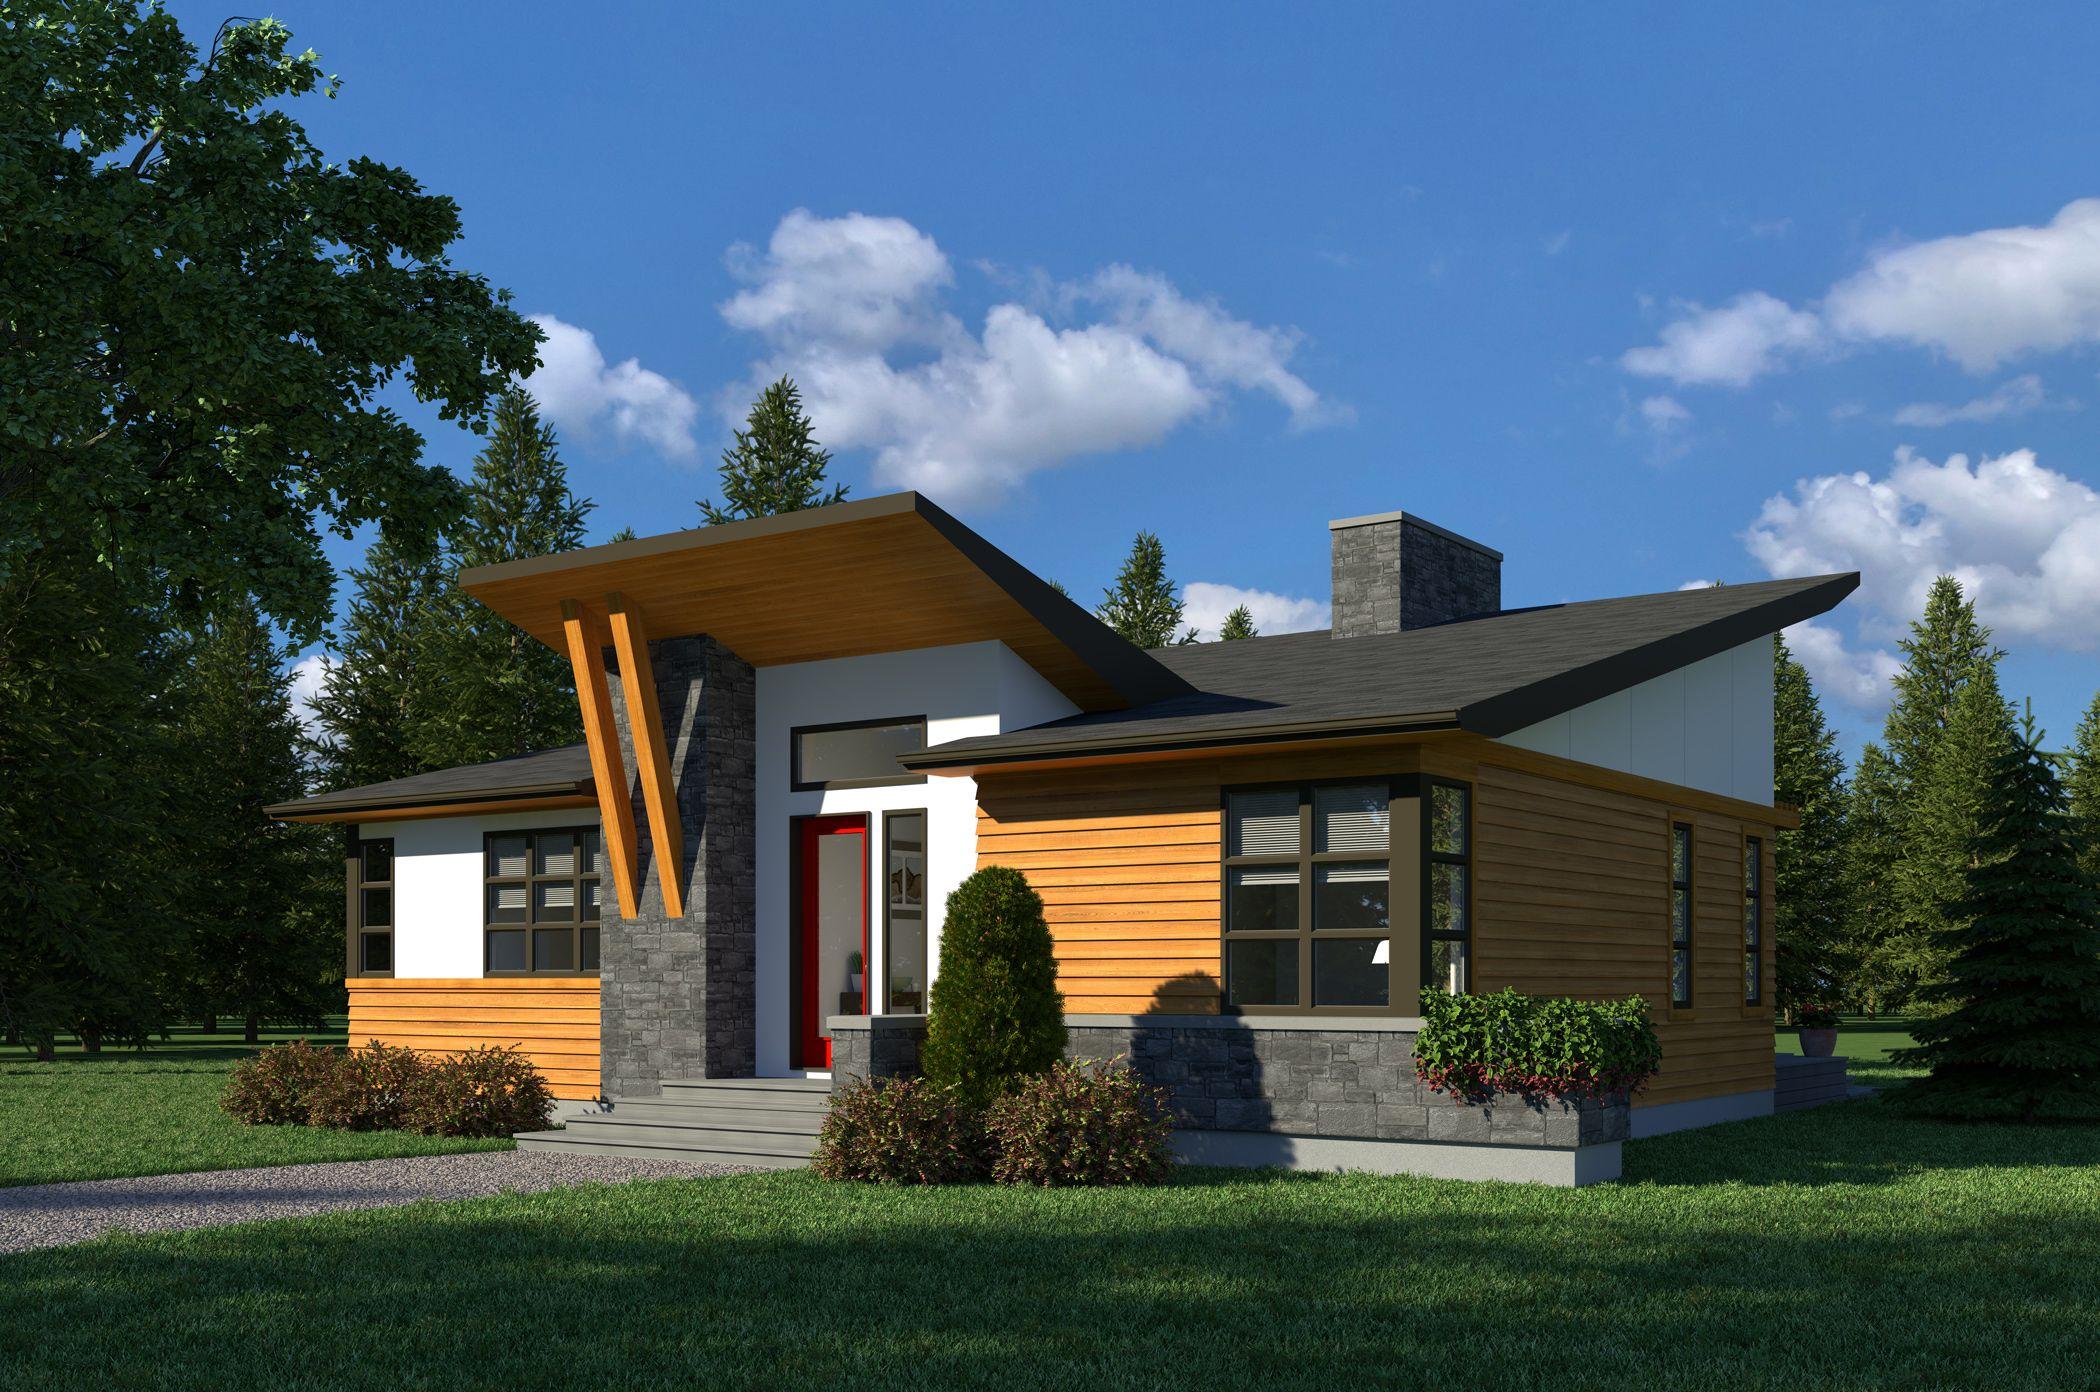 Contemporary Monarch 1250 Robinson Plans Contemporary House Plans House Front Design Modern Bungalow House